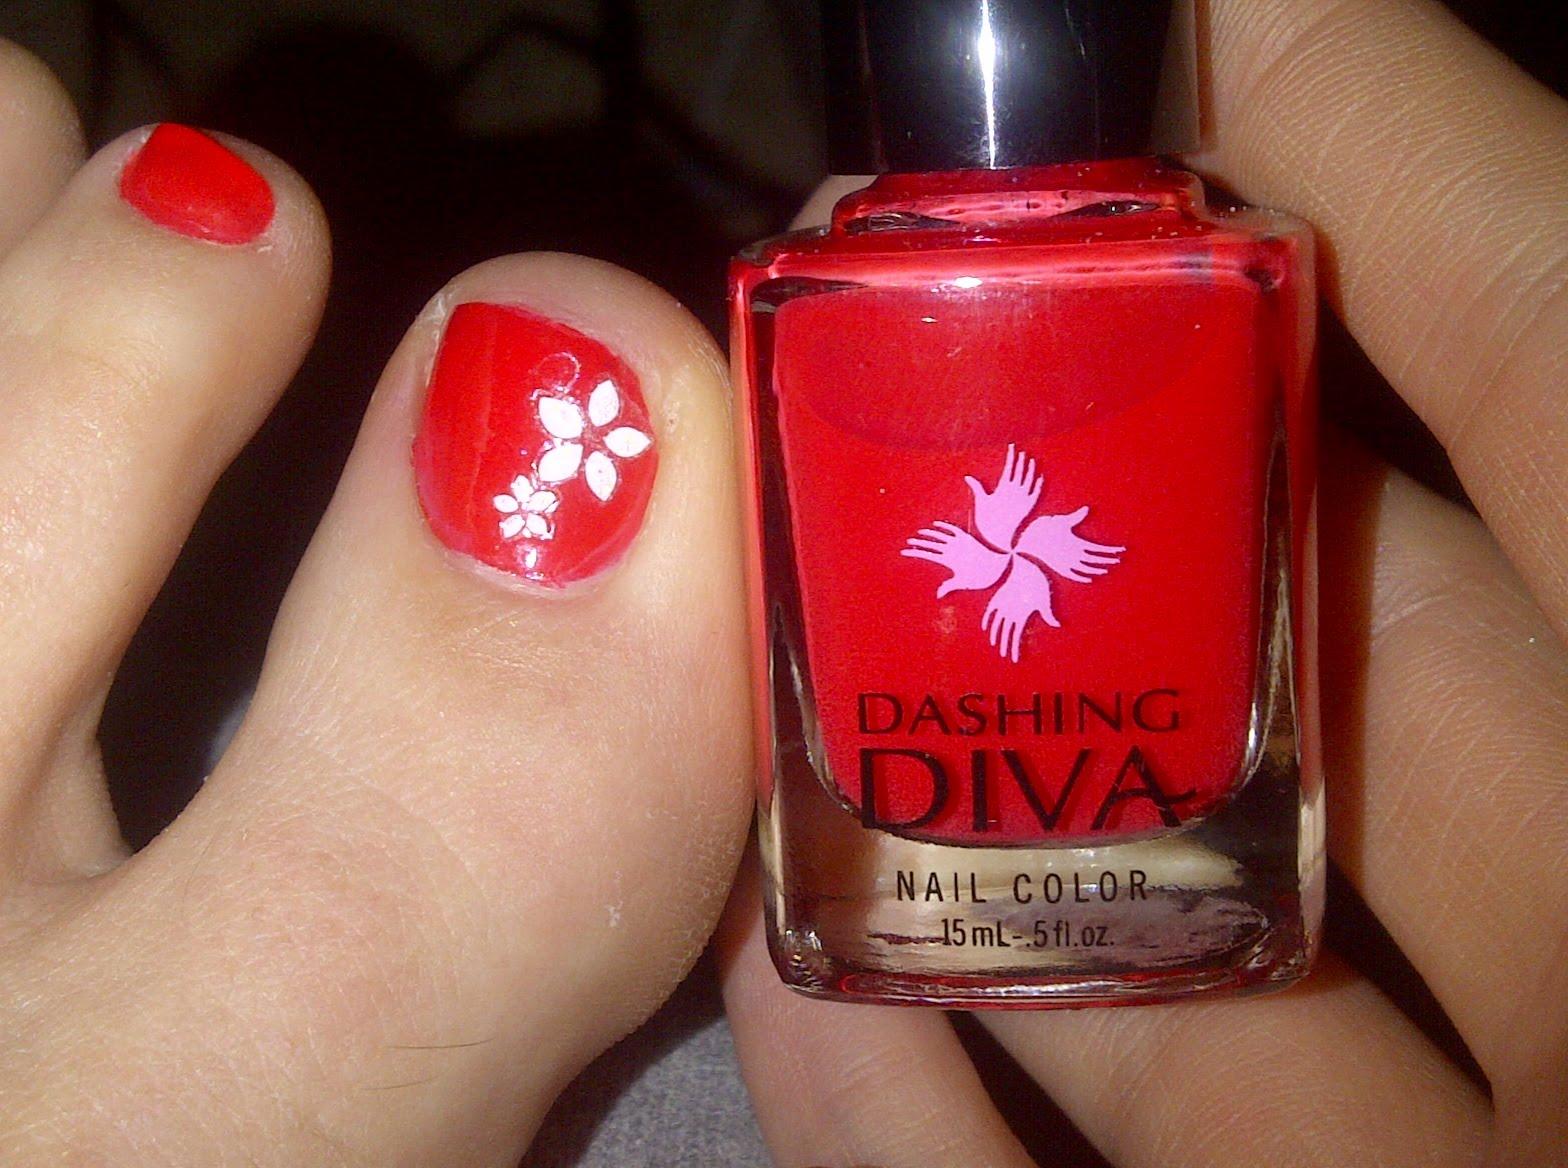 Bella 39 s beauty spot dashing diva new york slice nail polish - Diva nails and beauty ...